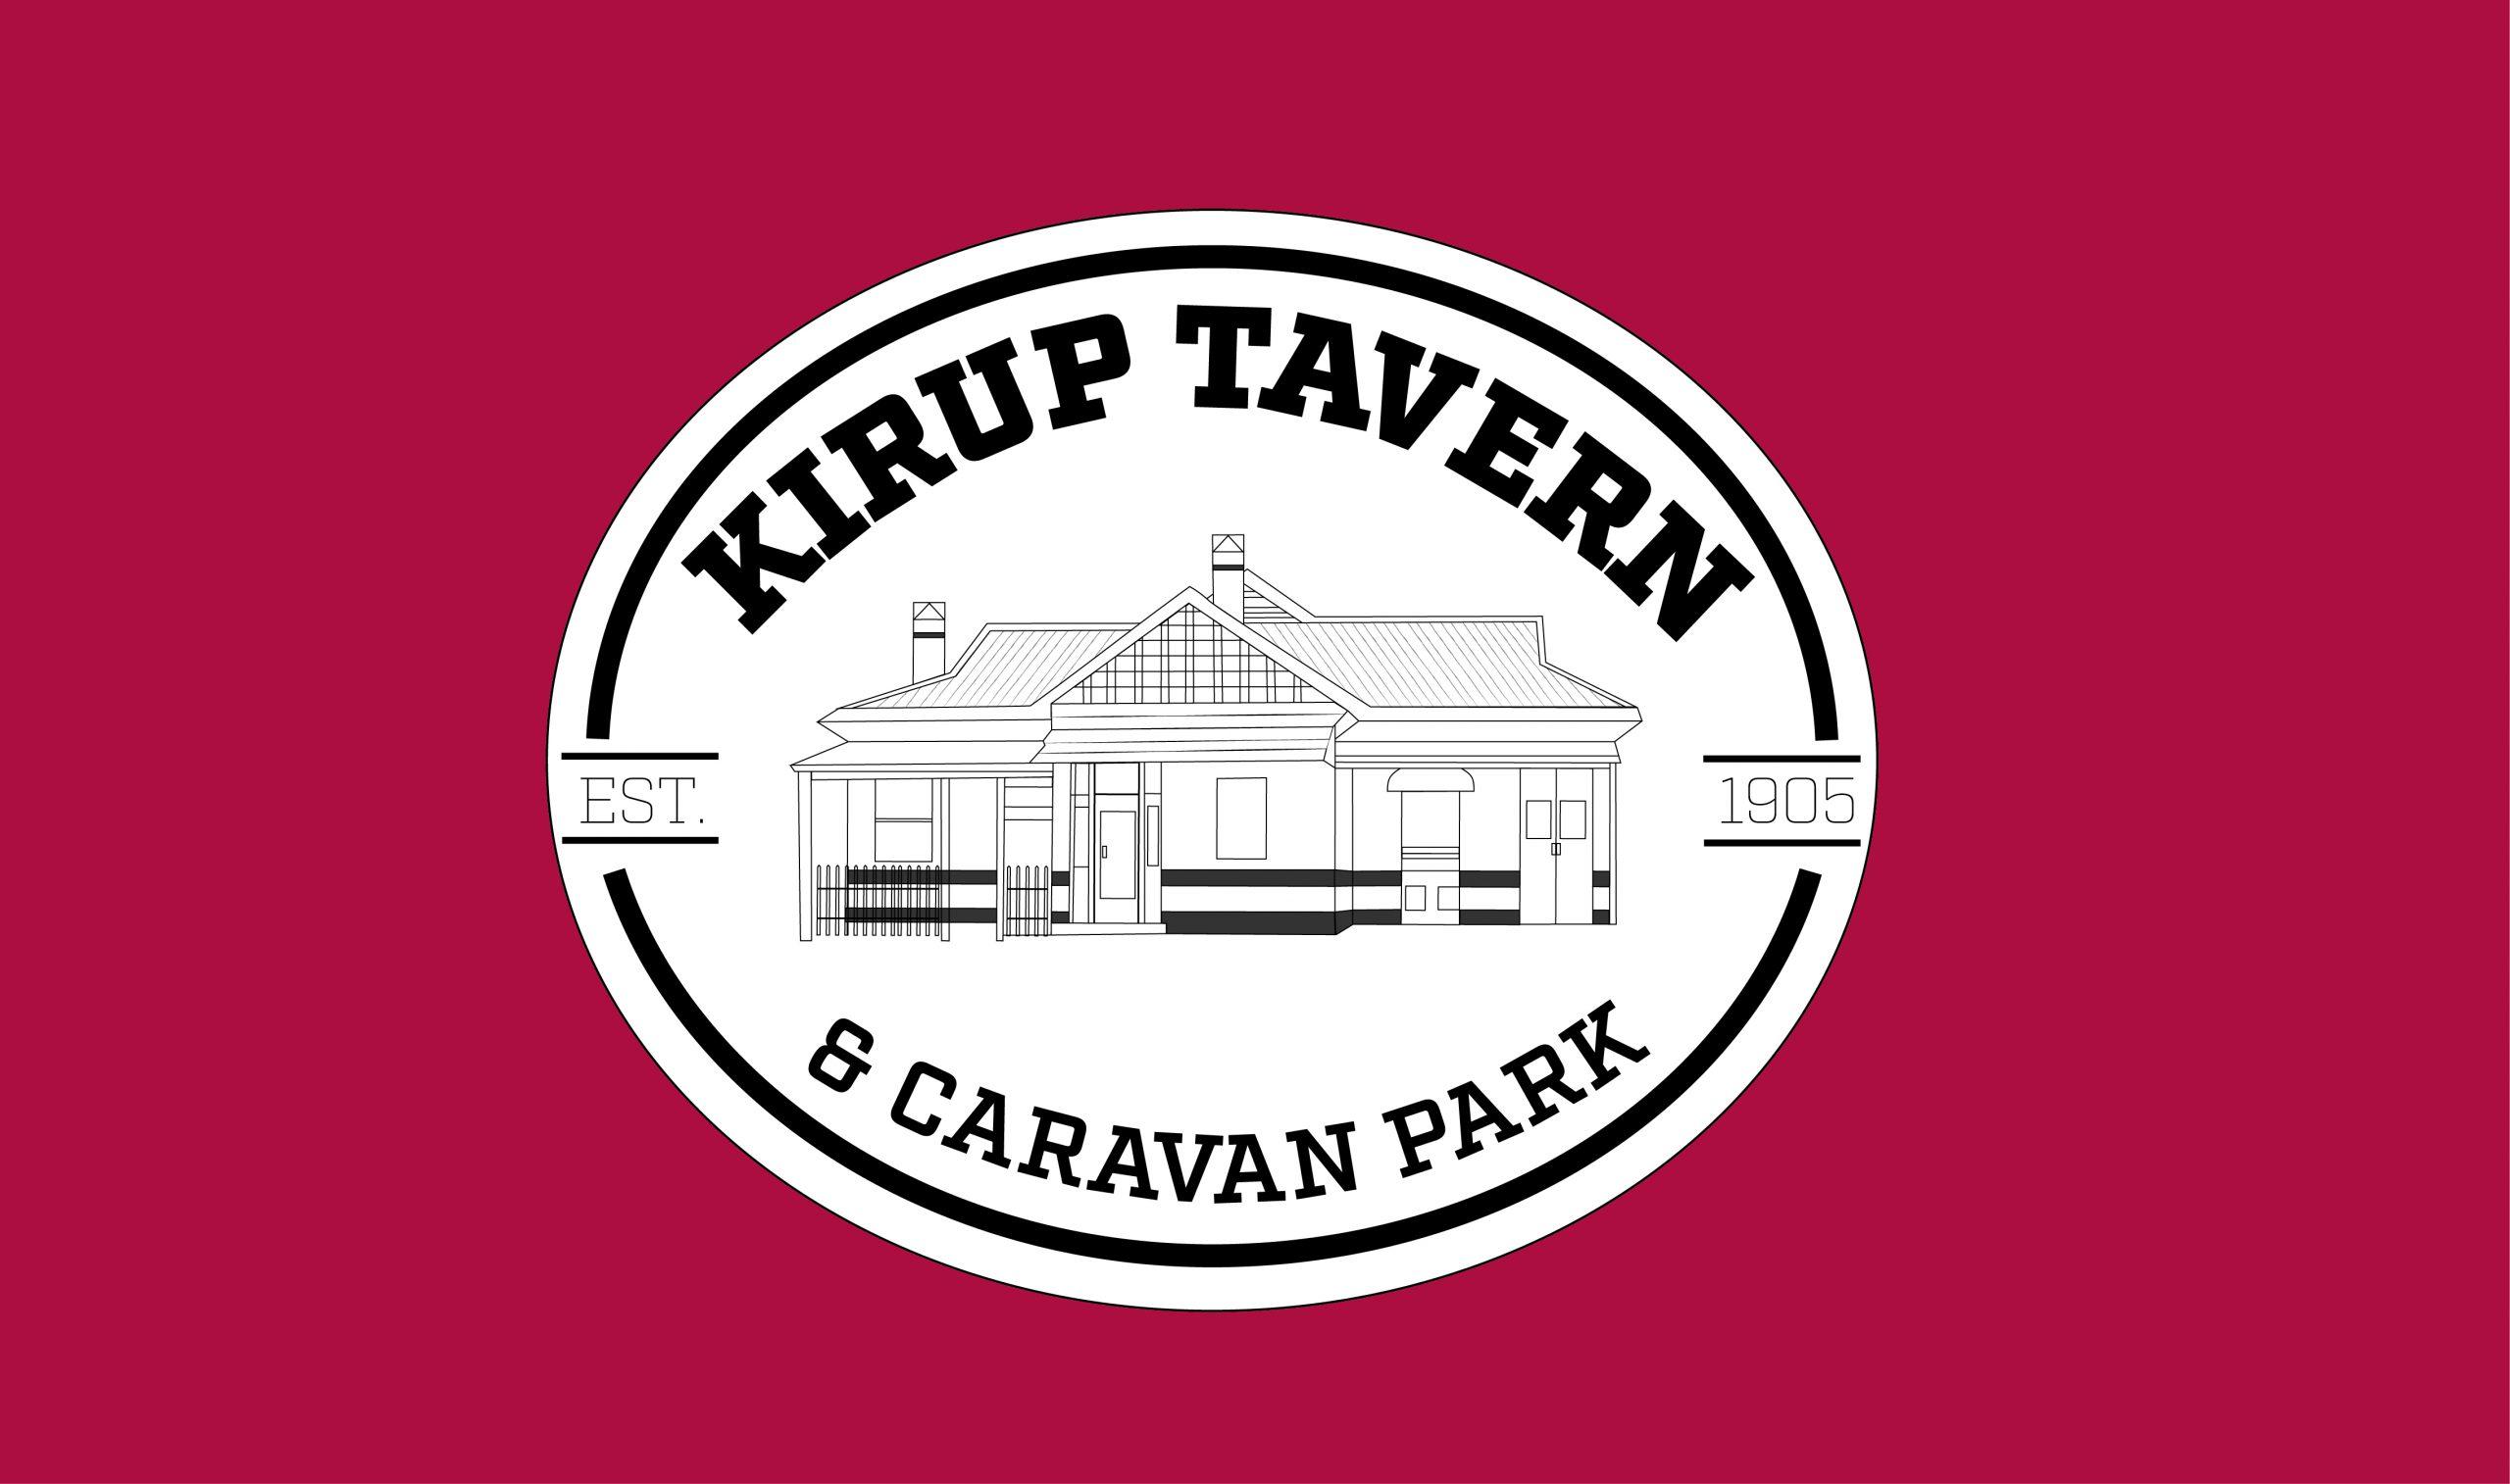 Business Spotlight - Kirup Tavern and Caravan Park